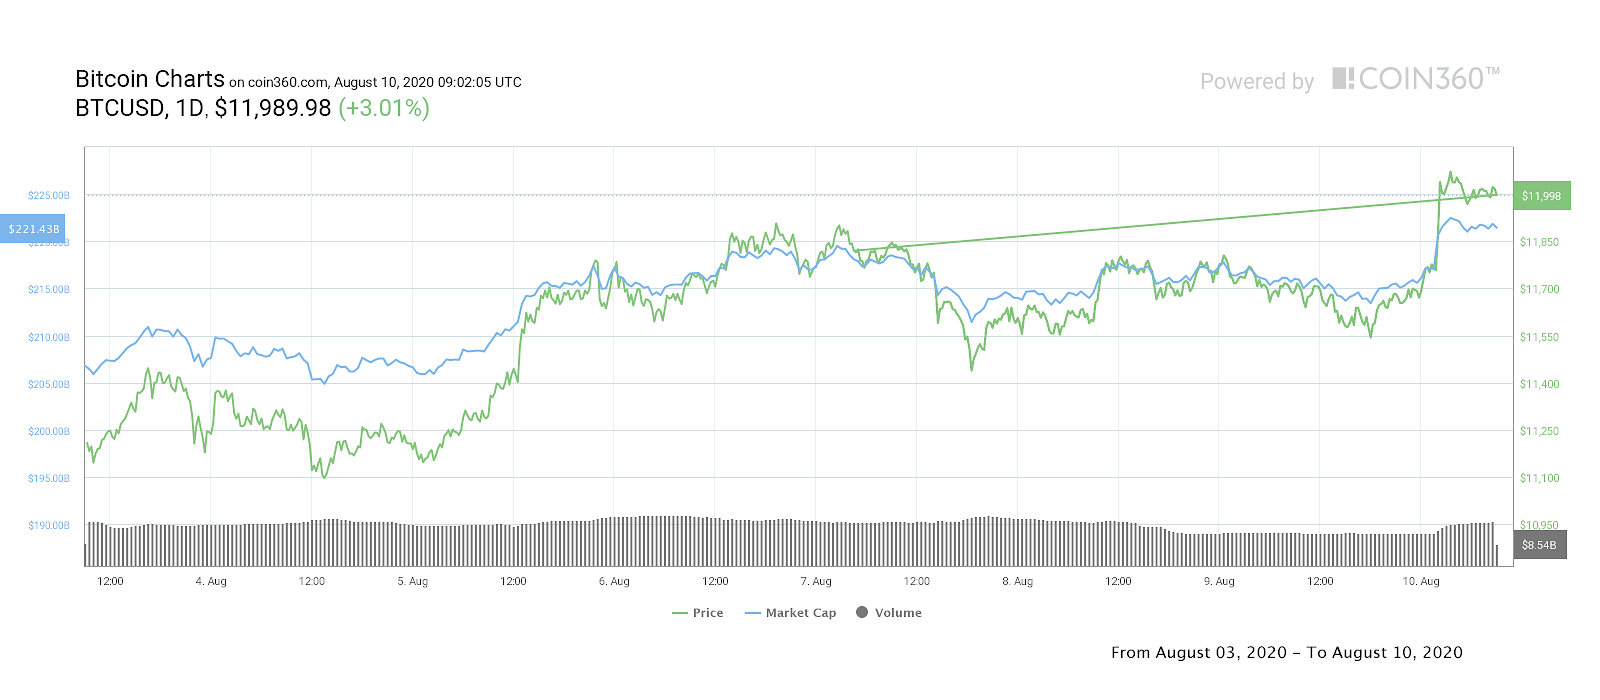 BTC/USD 7-day price chart